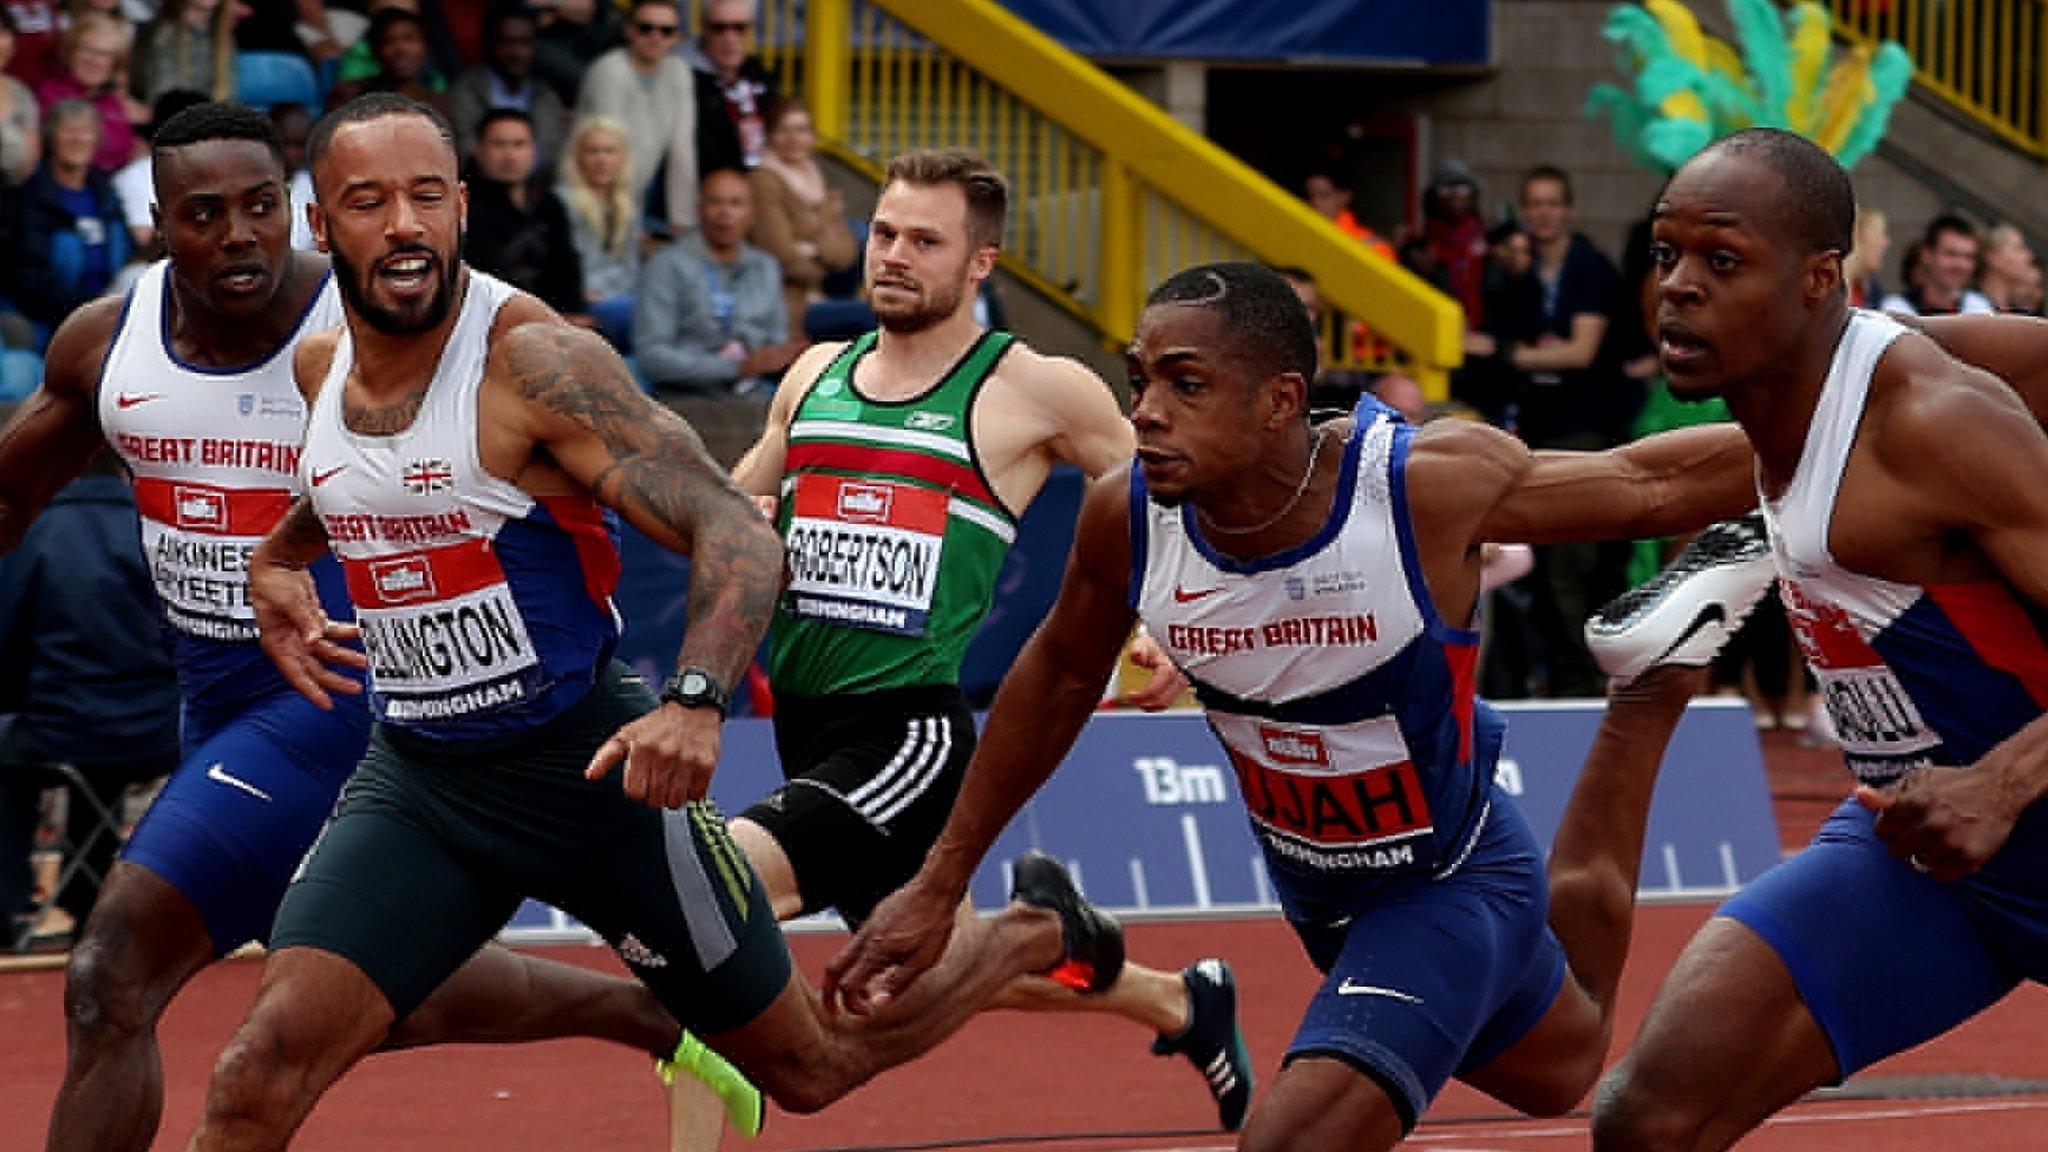 Dasaolu & Ellington secure GB 100m Olympic berths - report & highlights